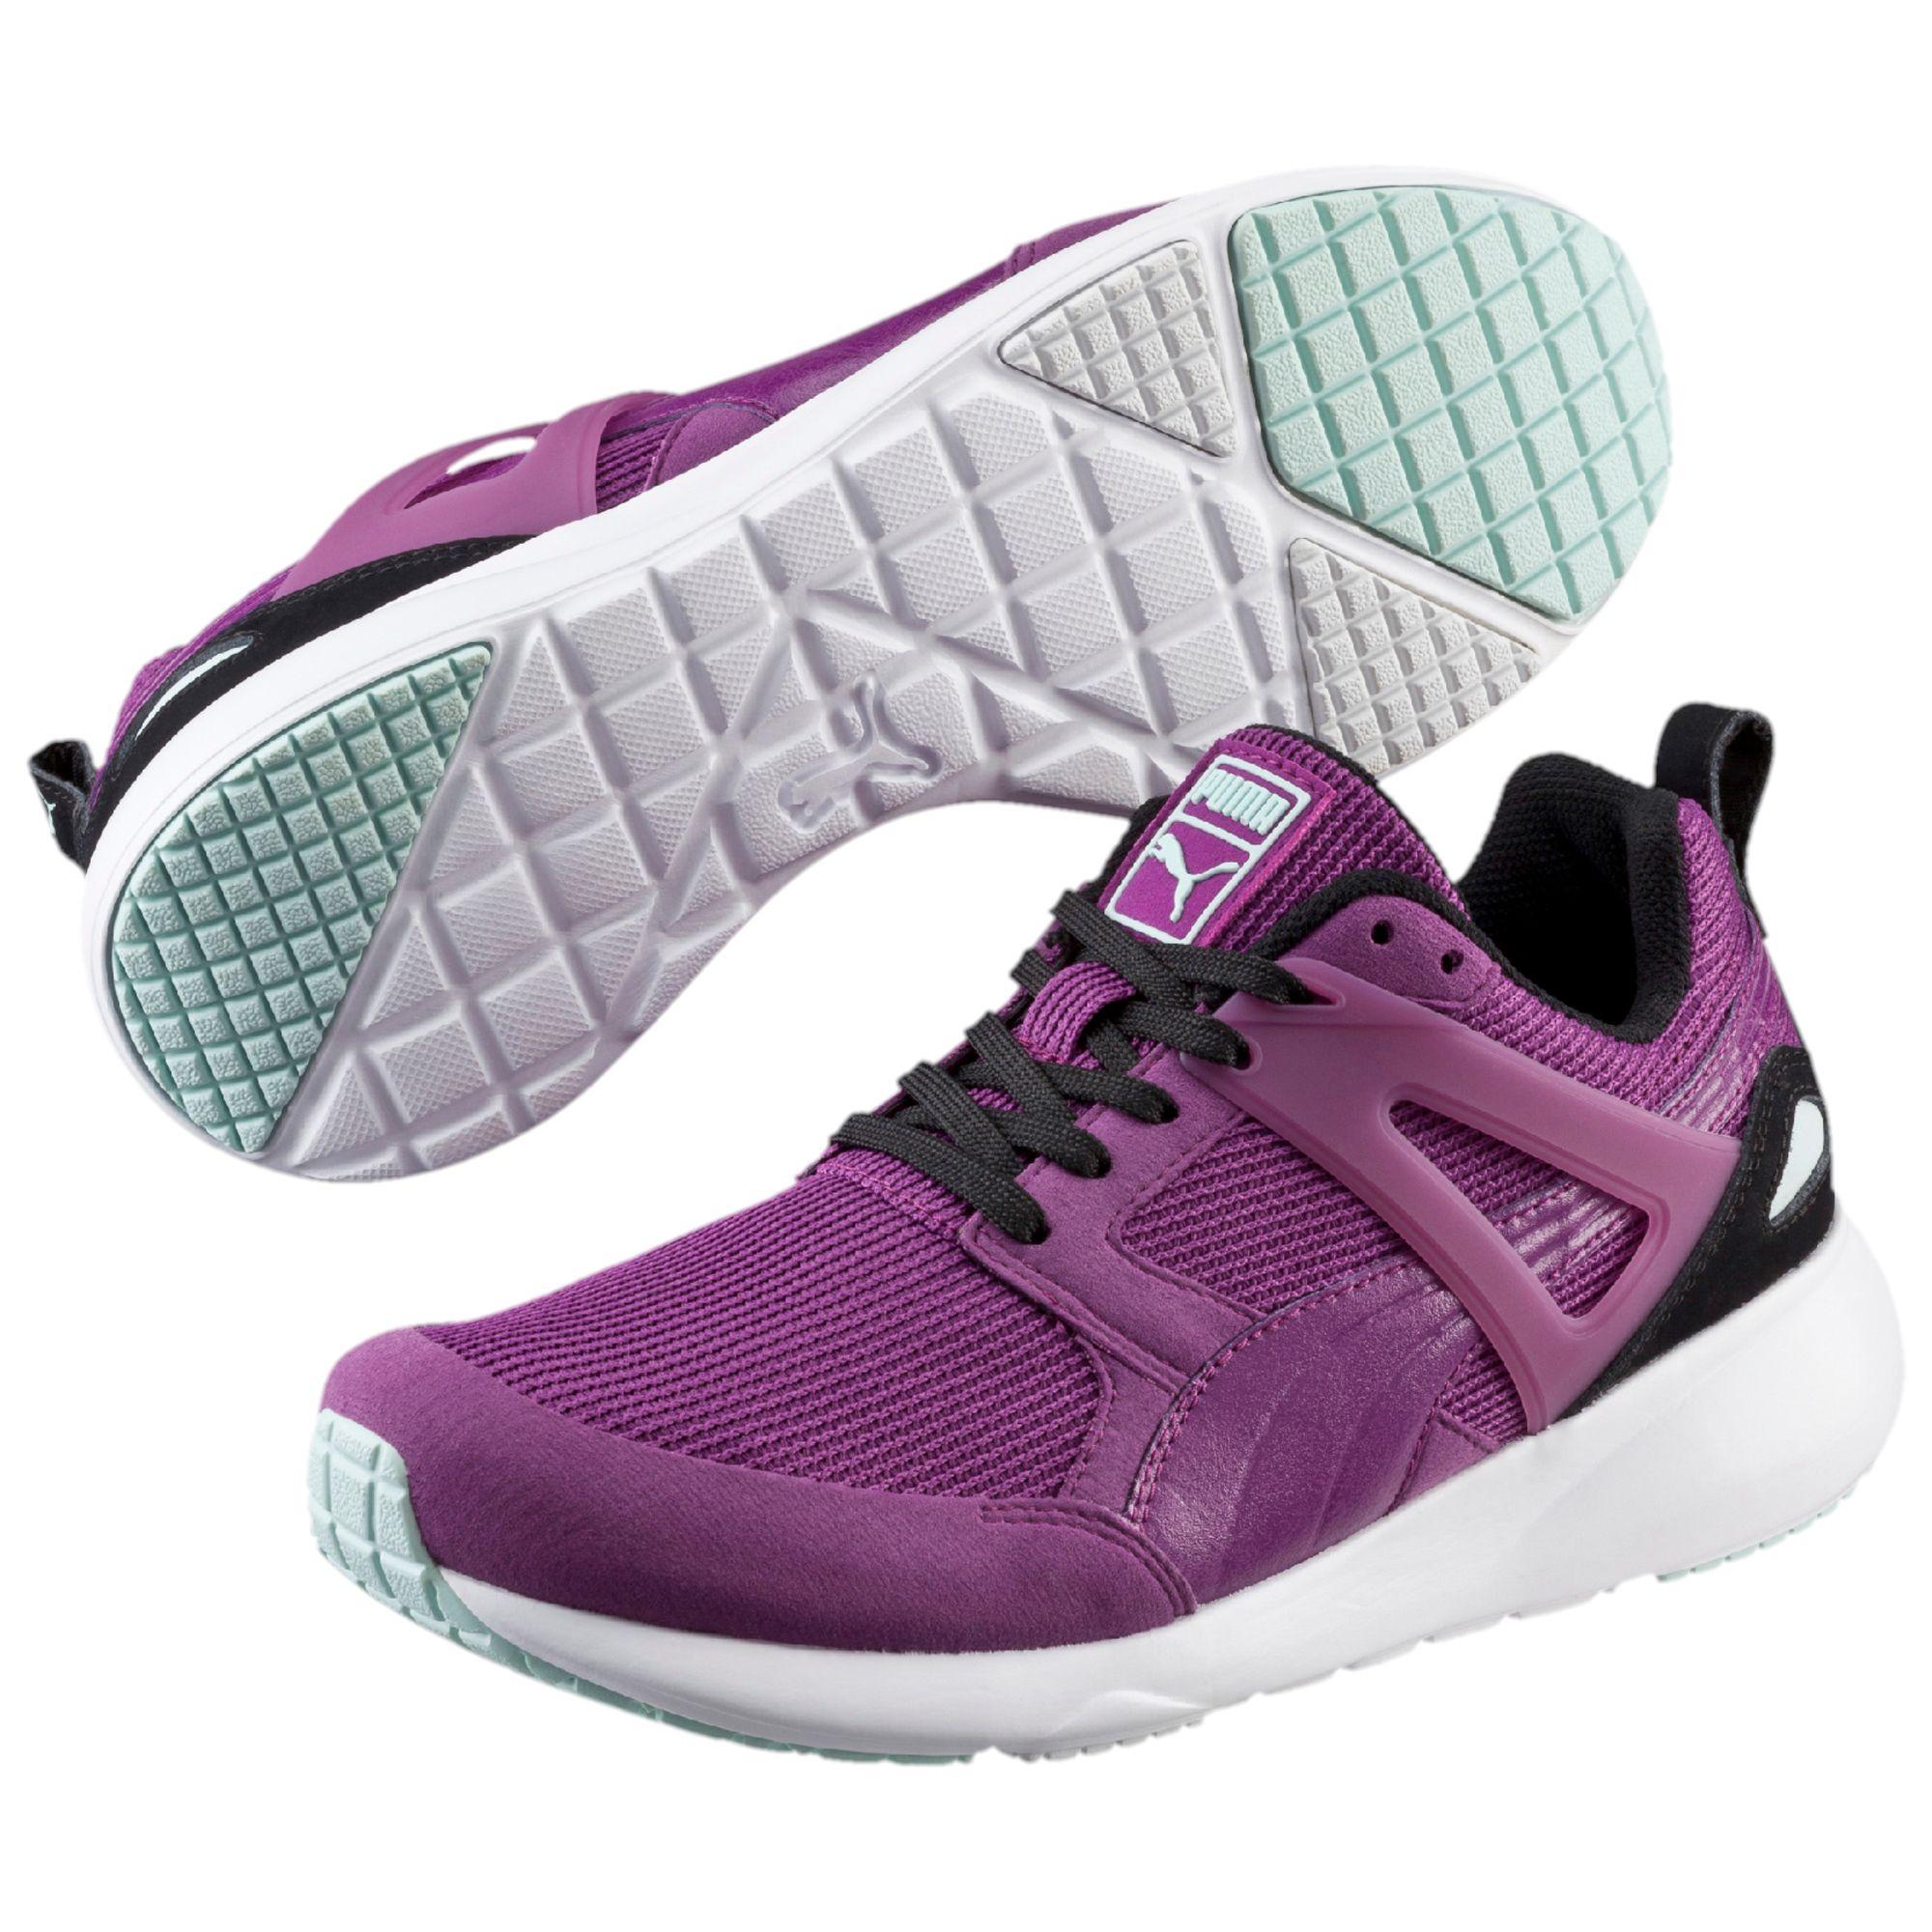 PUMA-Aril-Basic-Sports-Trainers-Footwear-Sneakers-Evolution-